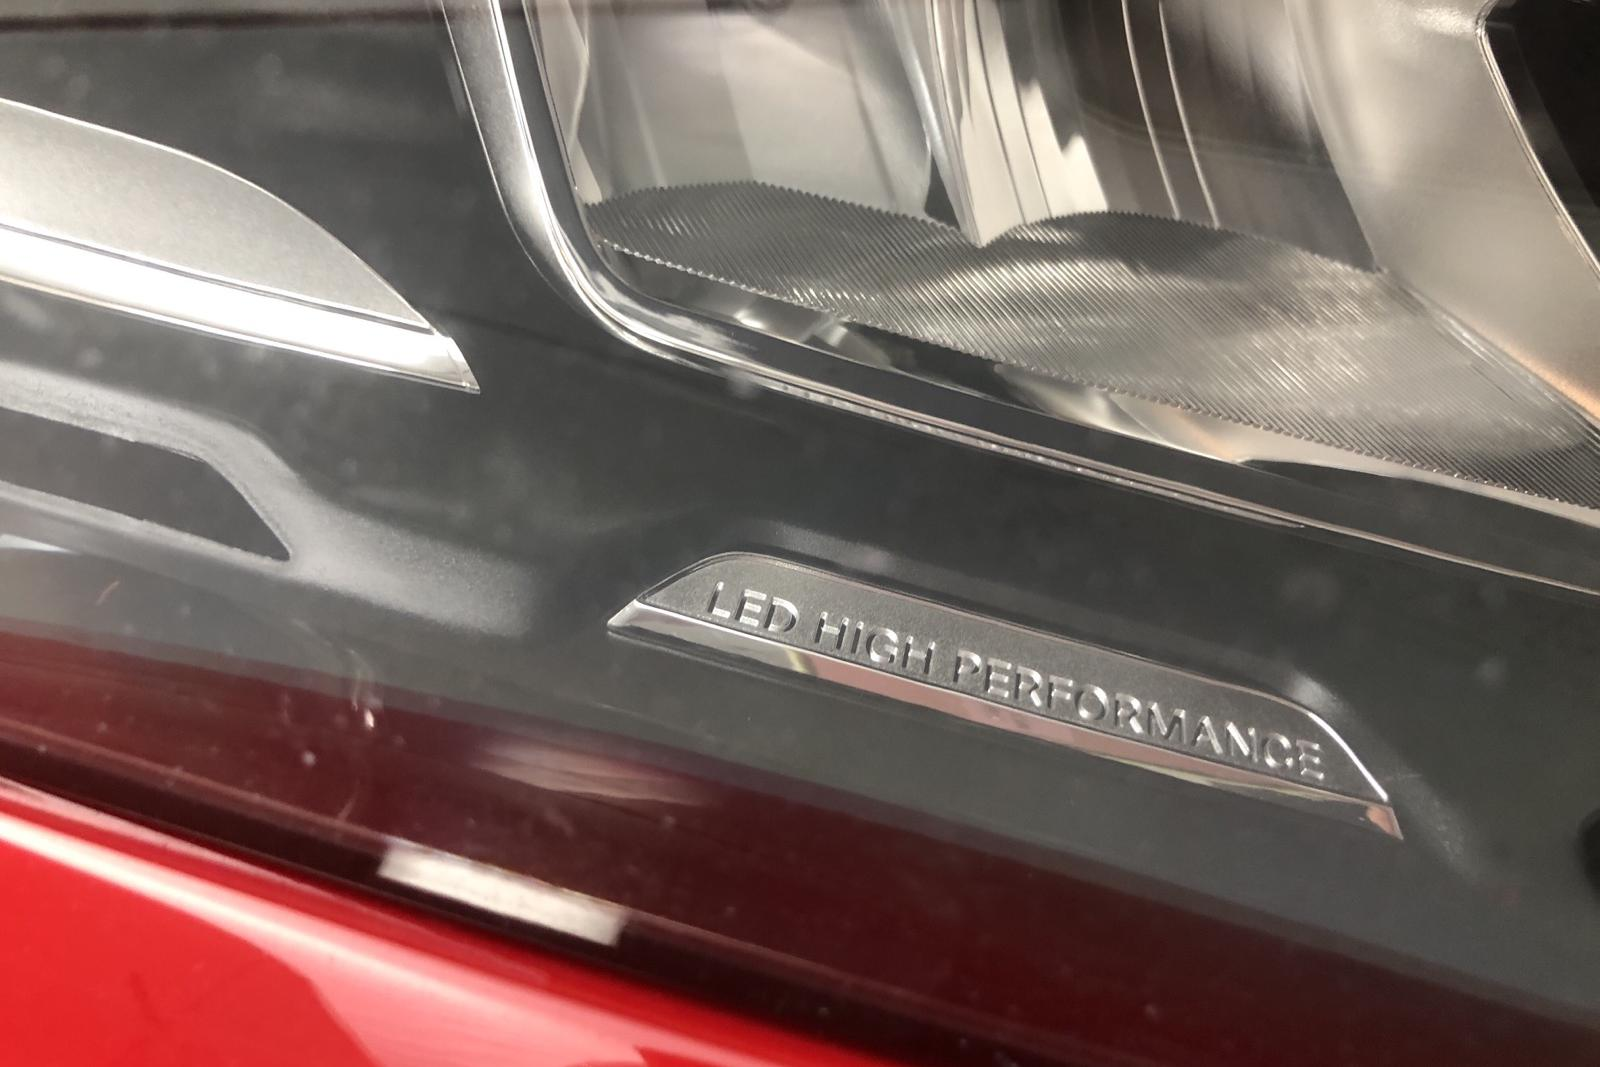 Mercedes CLA 220 d 4MATIC Shooting Brake X117 (177hk) - 8 386 mil - Automat - röd - 2018